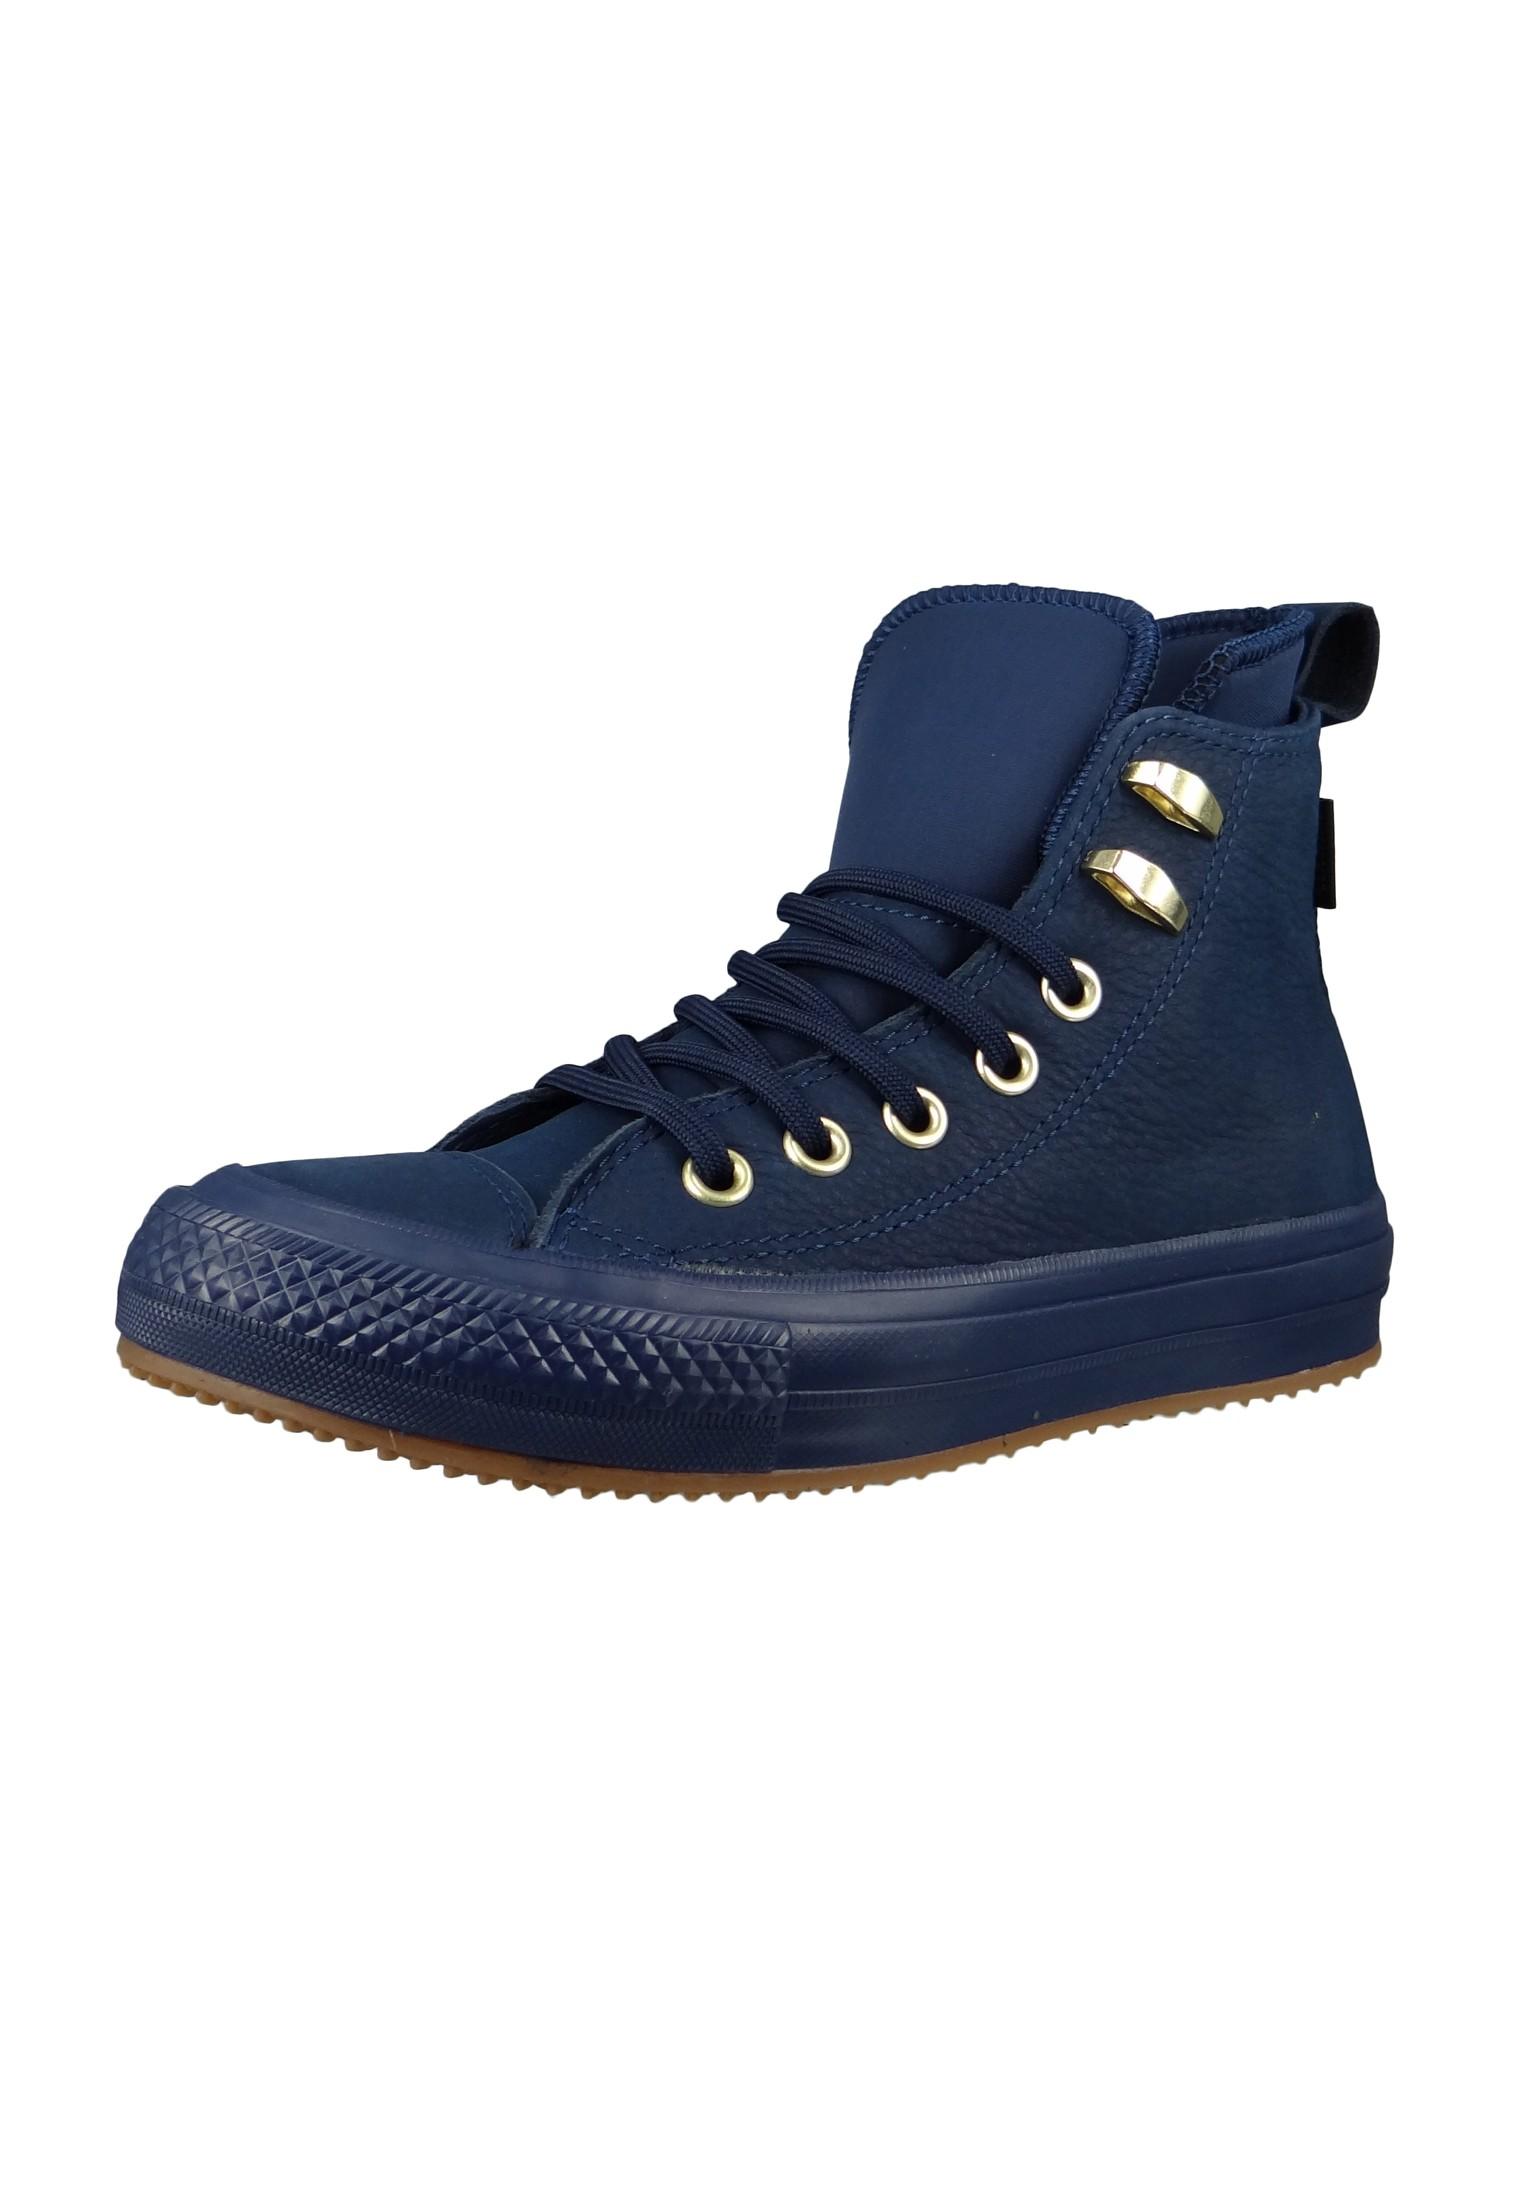 converse chucks blau leder 558820c chuck taylor all star wp boot hi midnight navy midnight navy. Black Bedroom Furniture Sets. Home Design Ideas